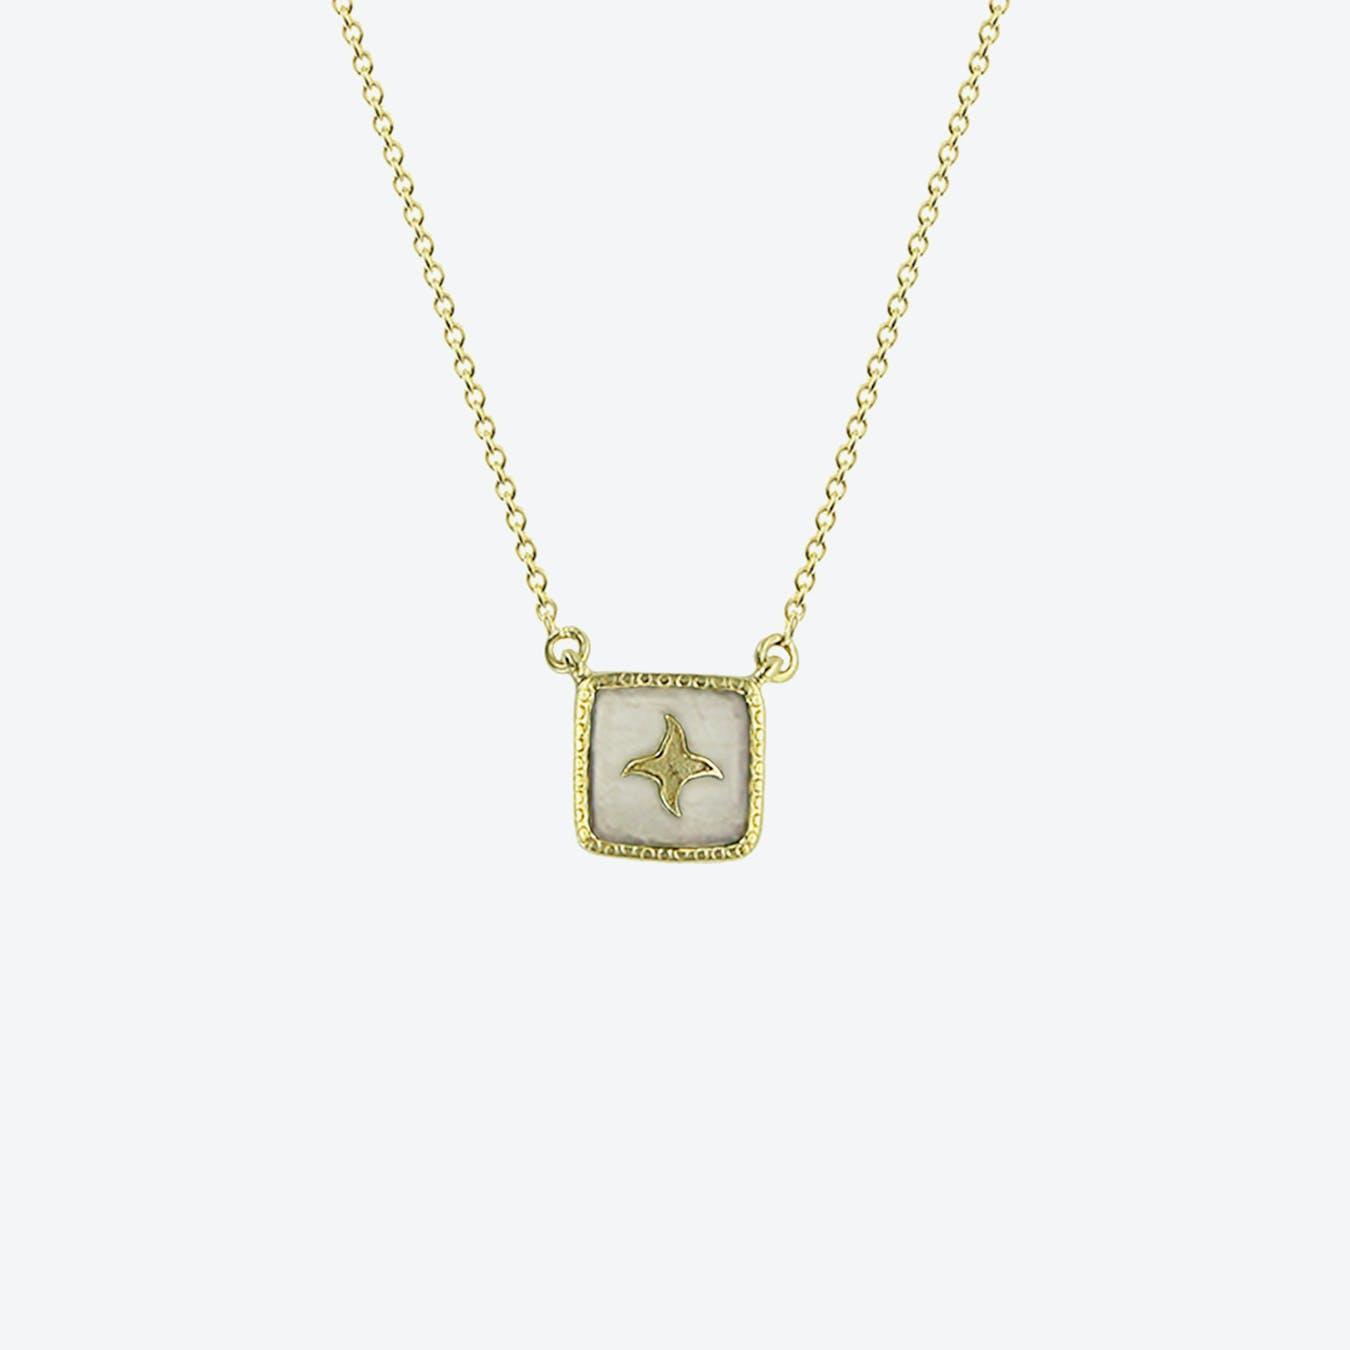 Meruba Necklace - Moonstone